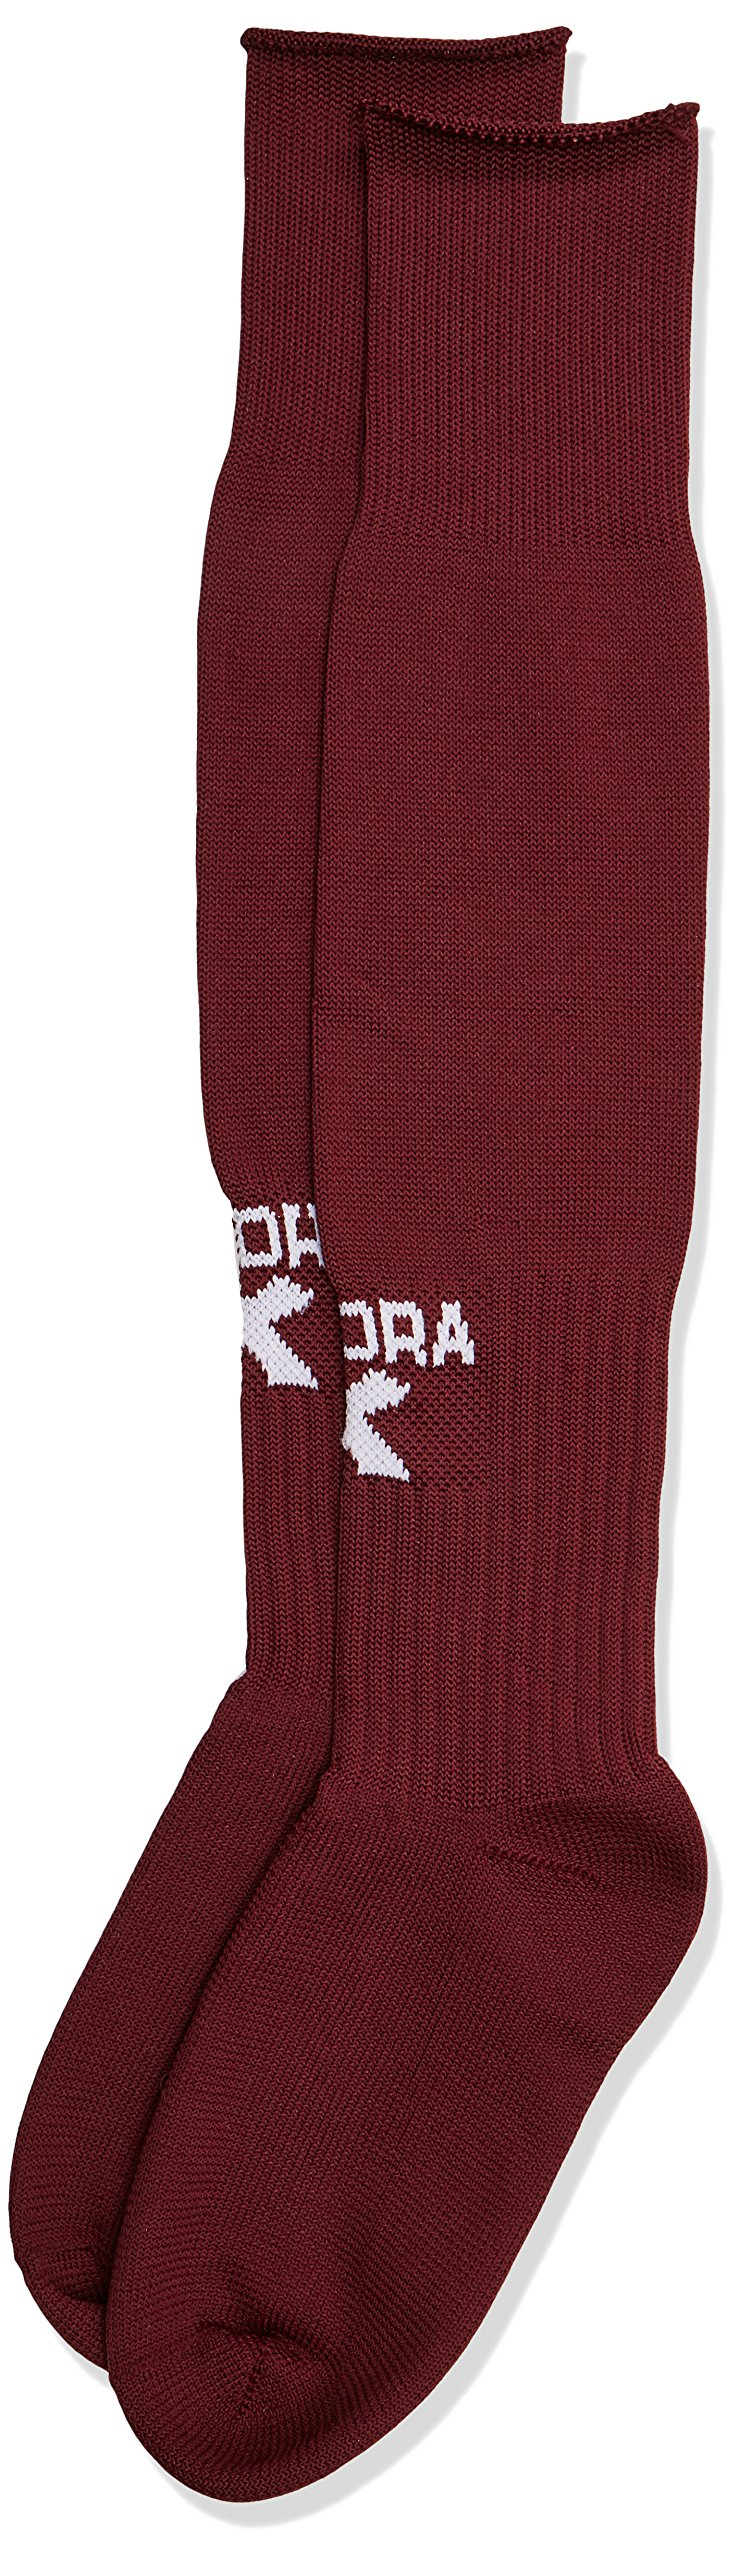 Diadora Squadra Soccer Socks, Small, Maroon by Diadora